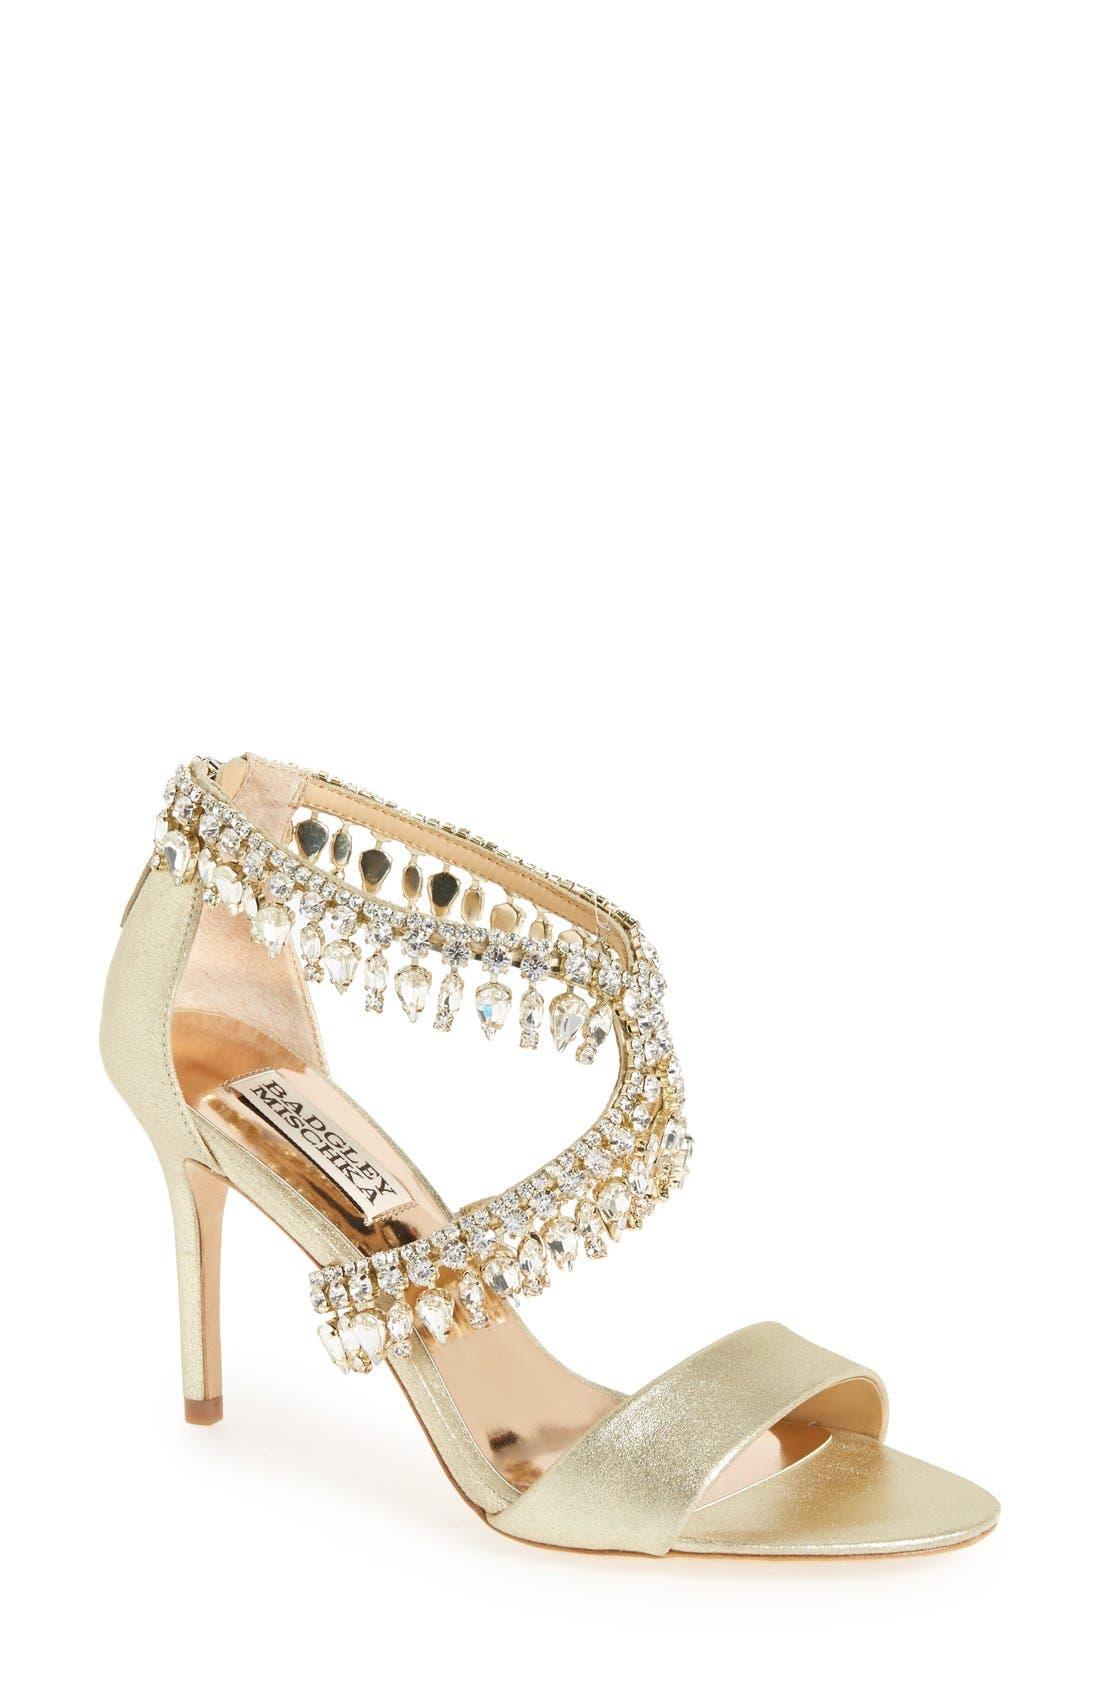 Main Image - Badgley Mischka Crystal-Embellished Sandal (Women)